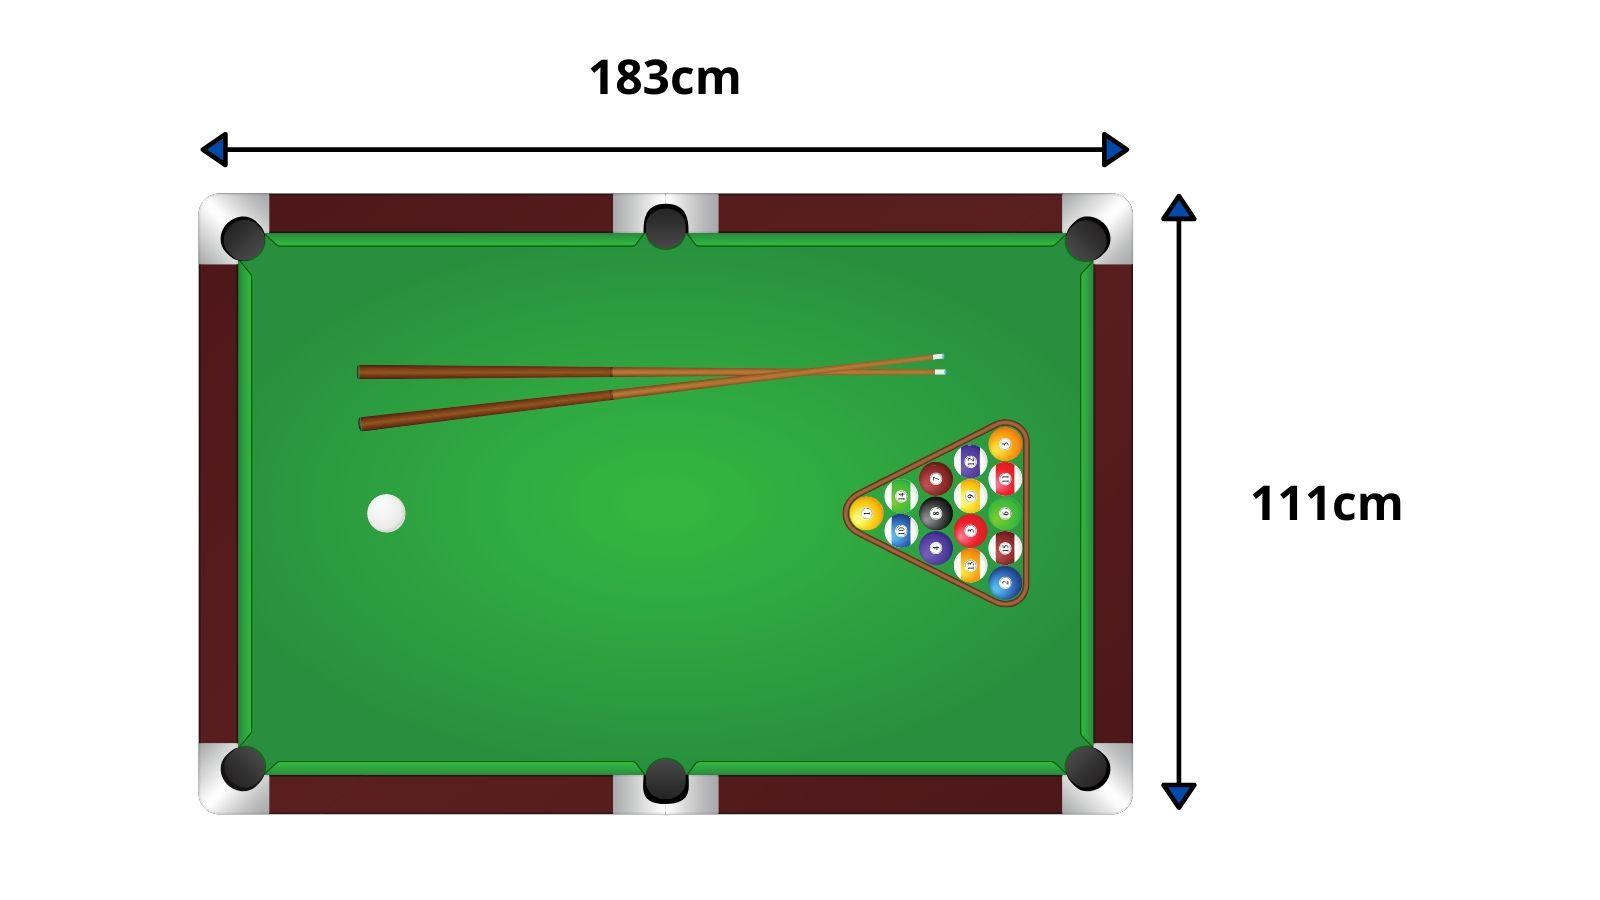 6 x 3 Pool Table Dimensions